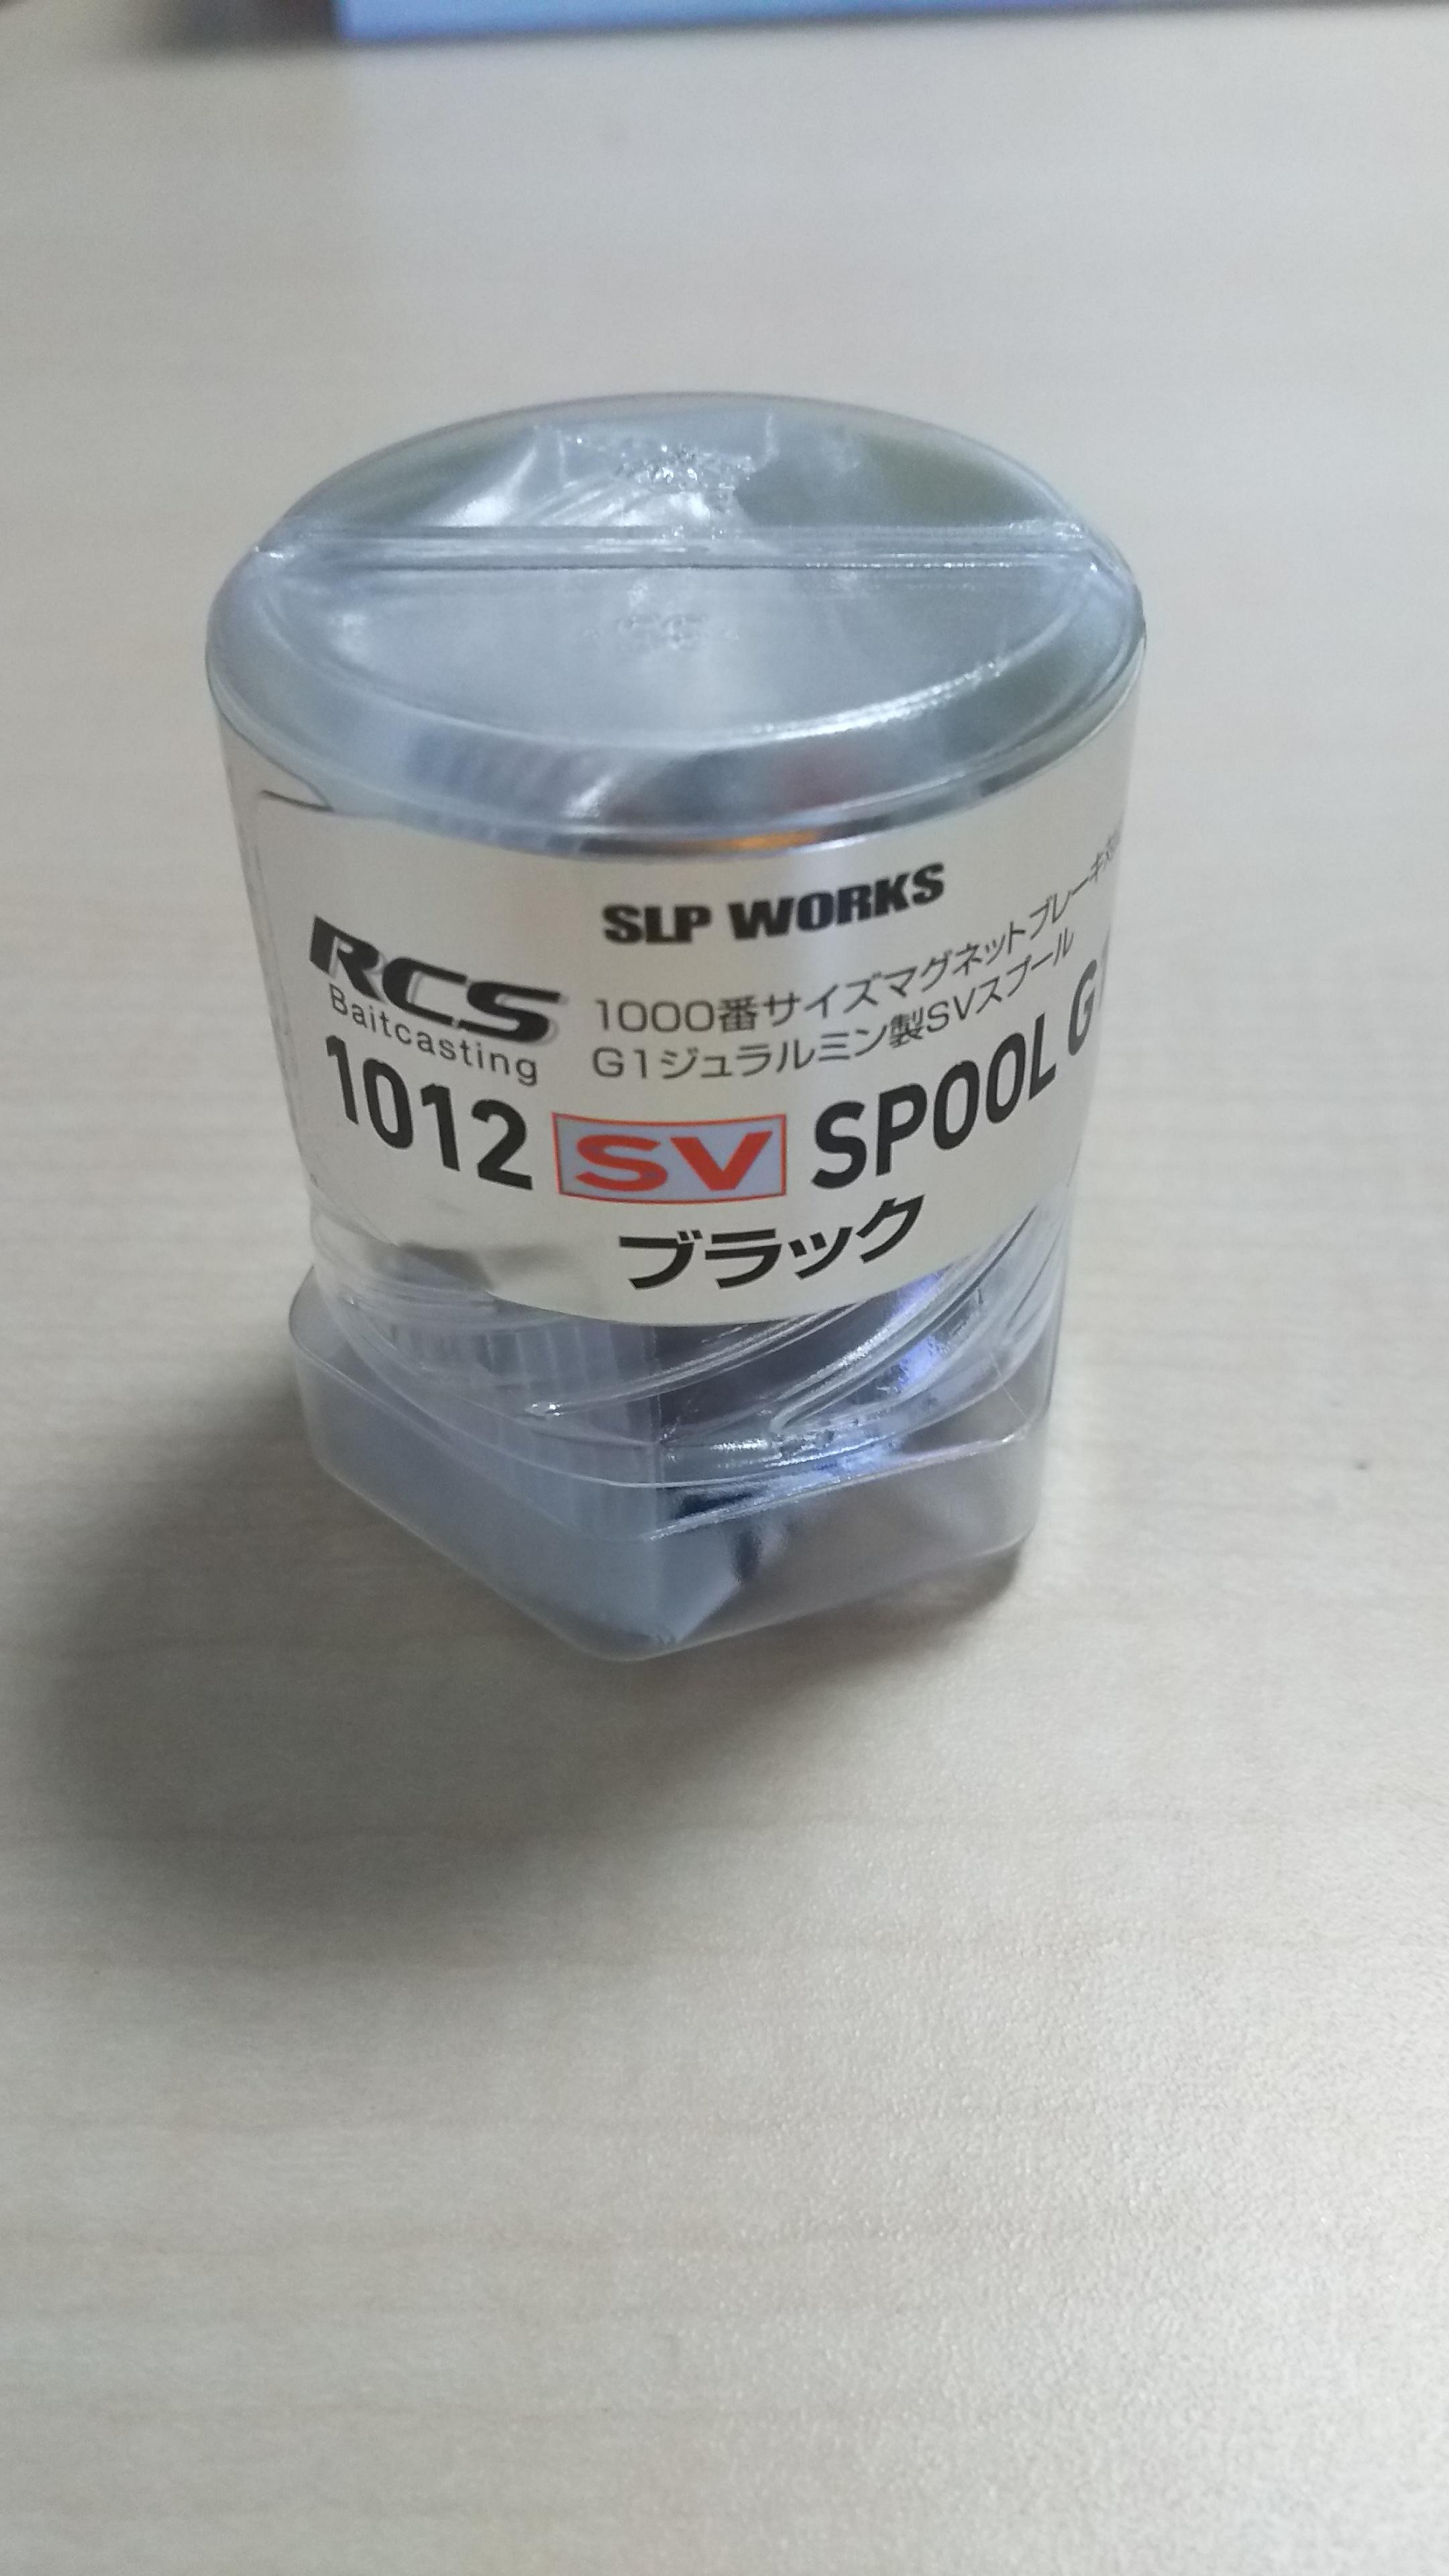 RCS1012 G1 SVスプール